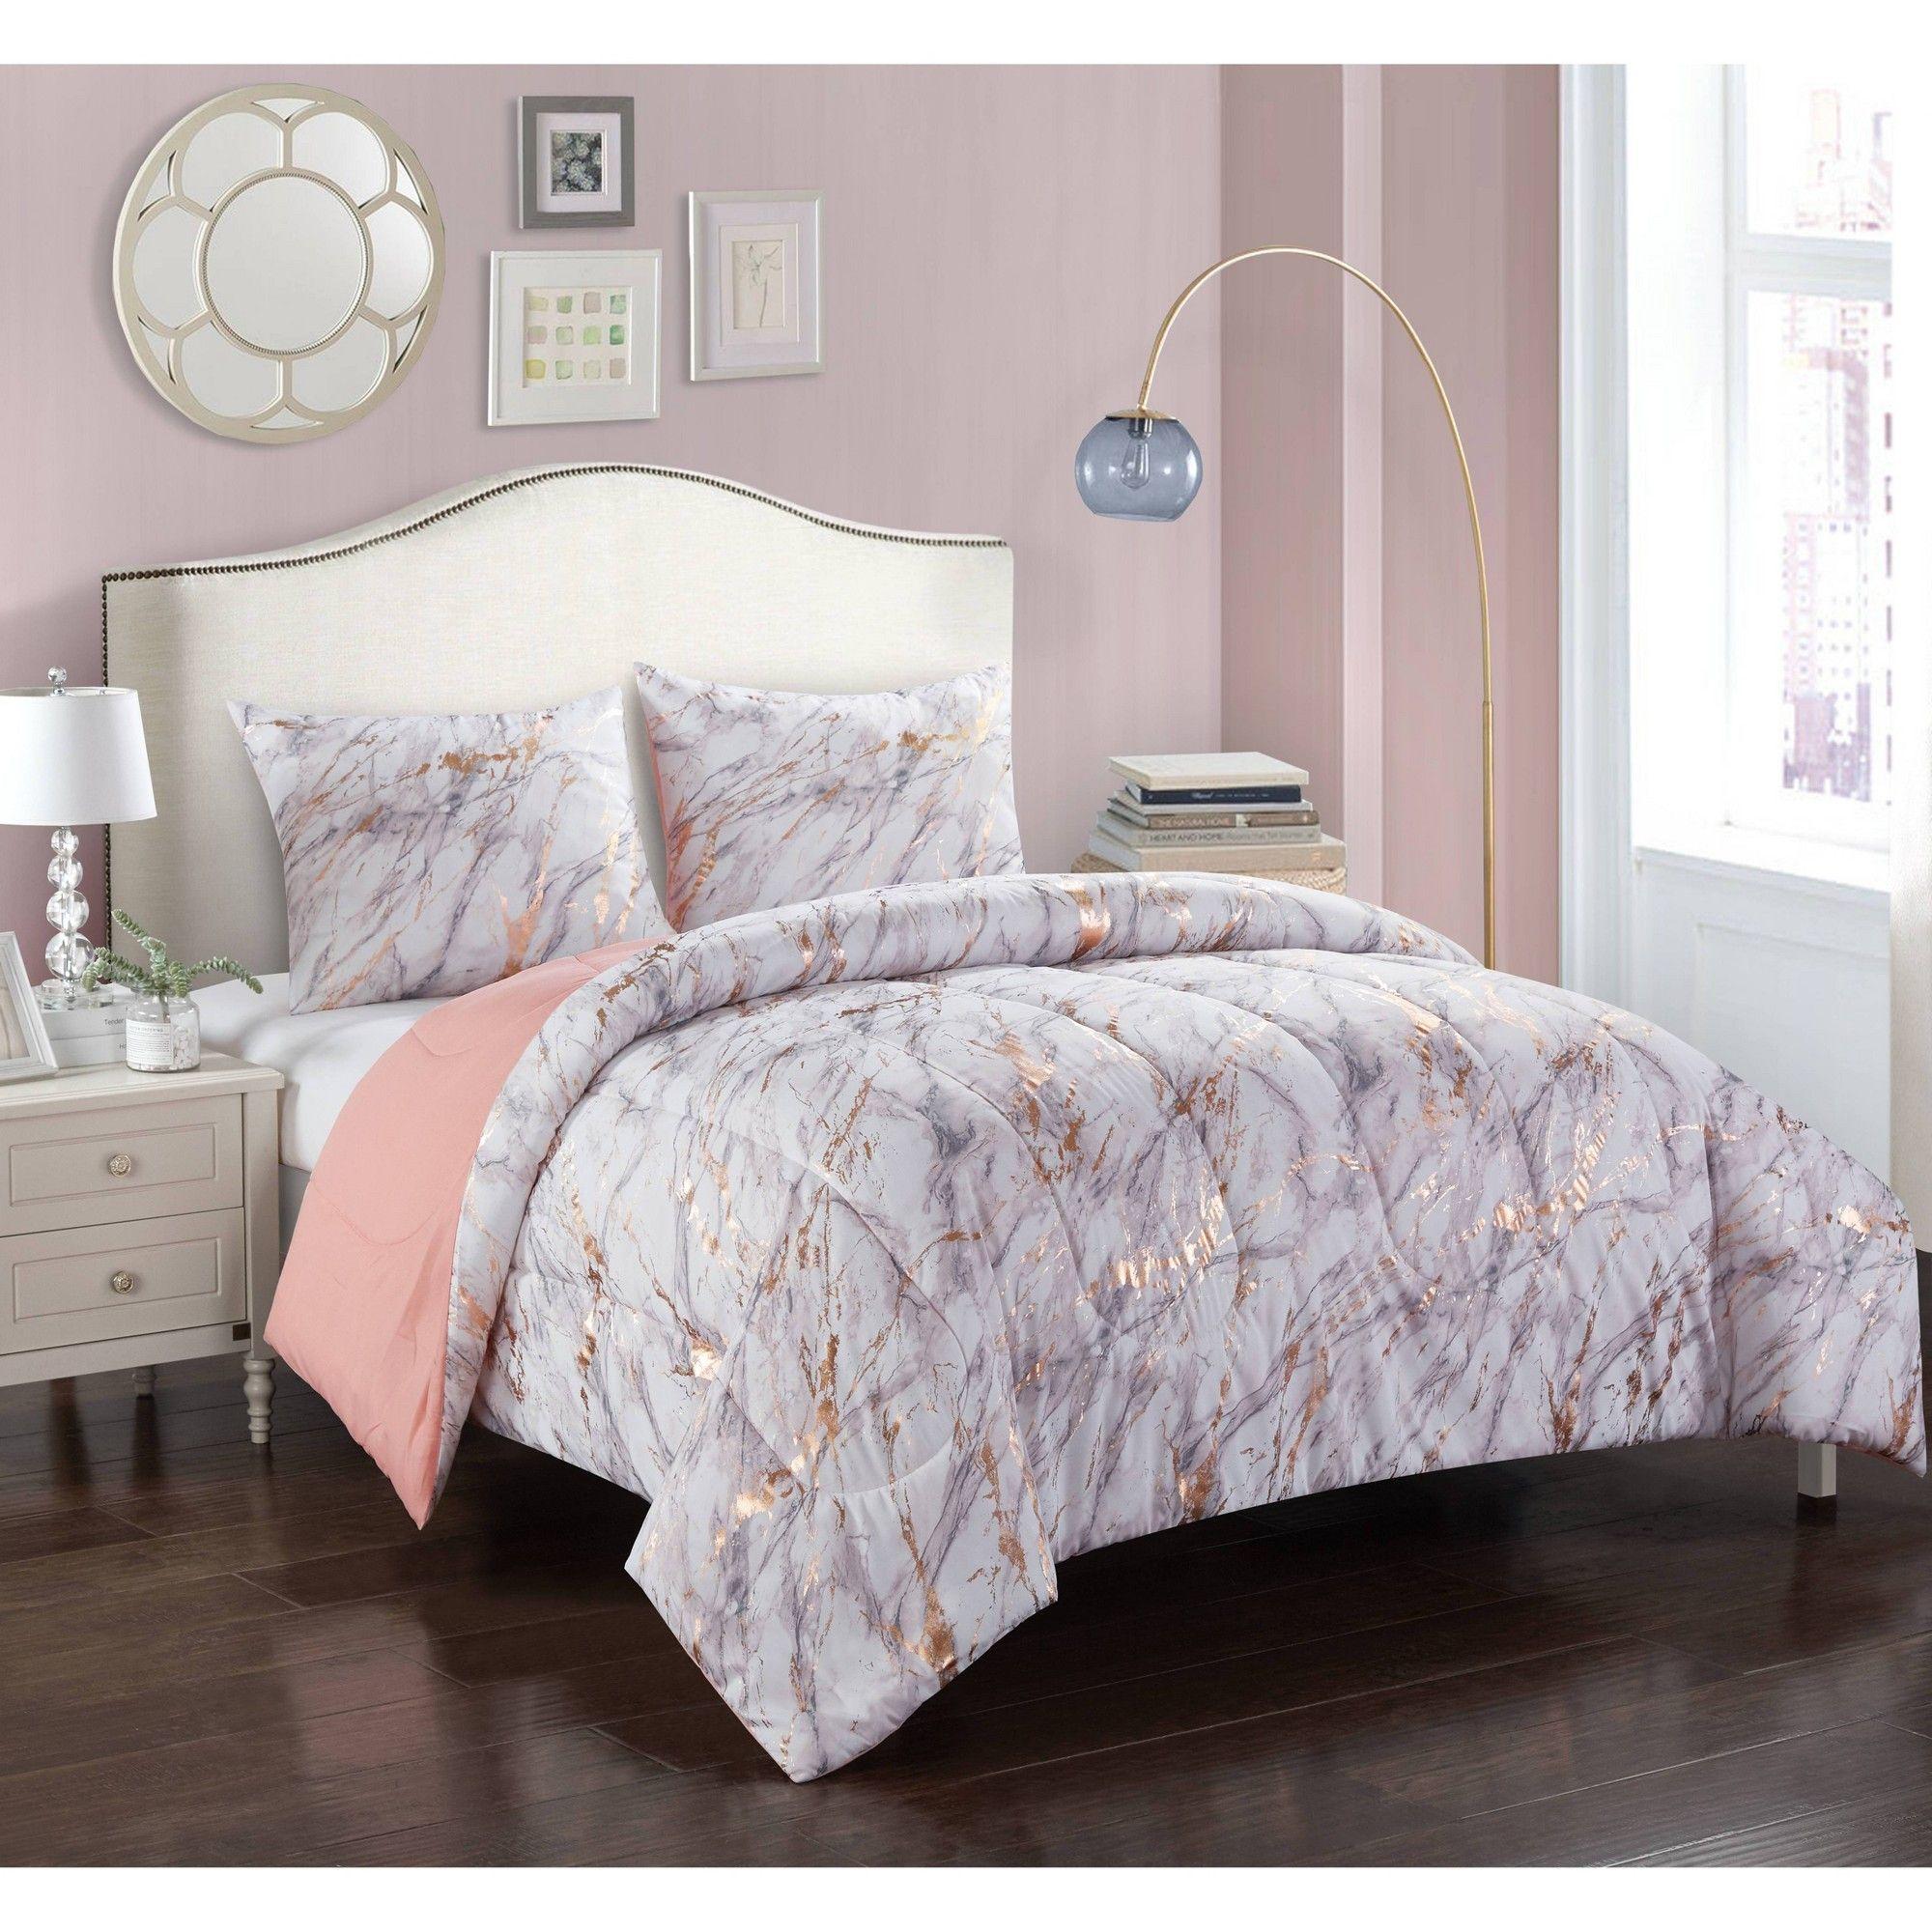 Full Queen Rose Gold Marble Comforter Set Rose Gold Heritage